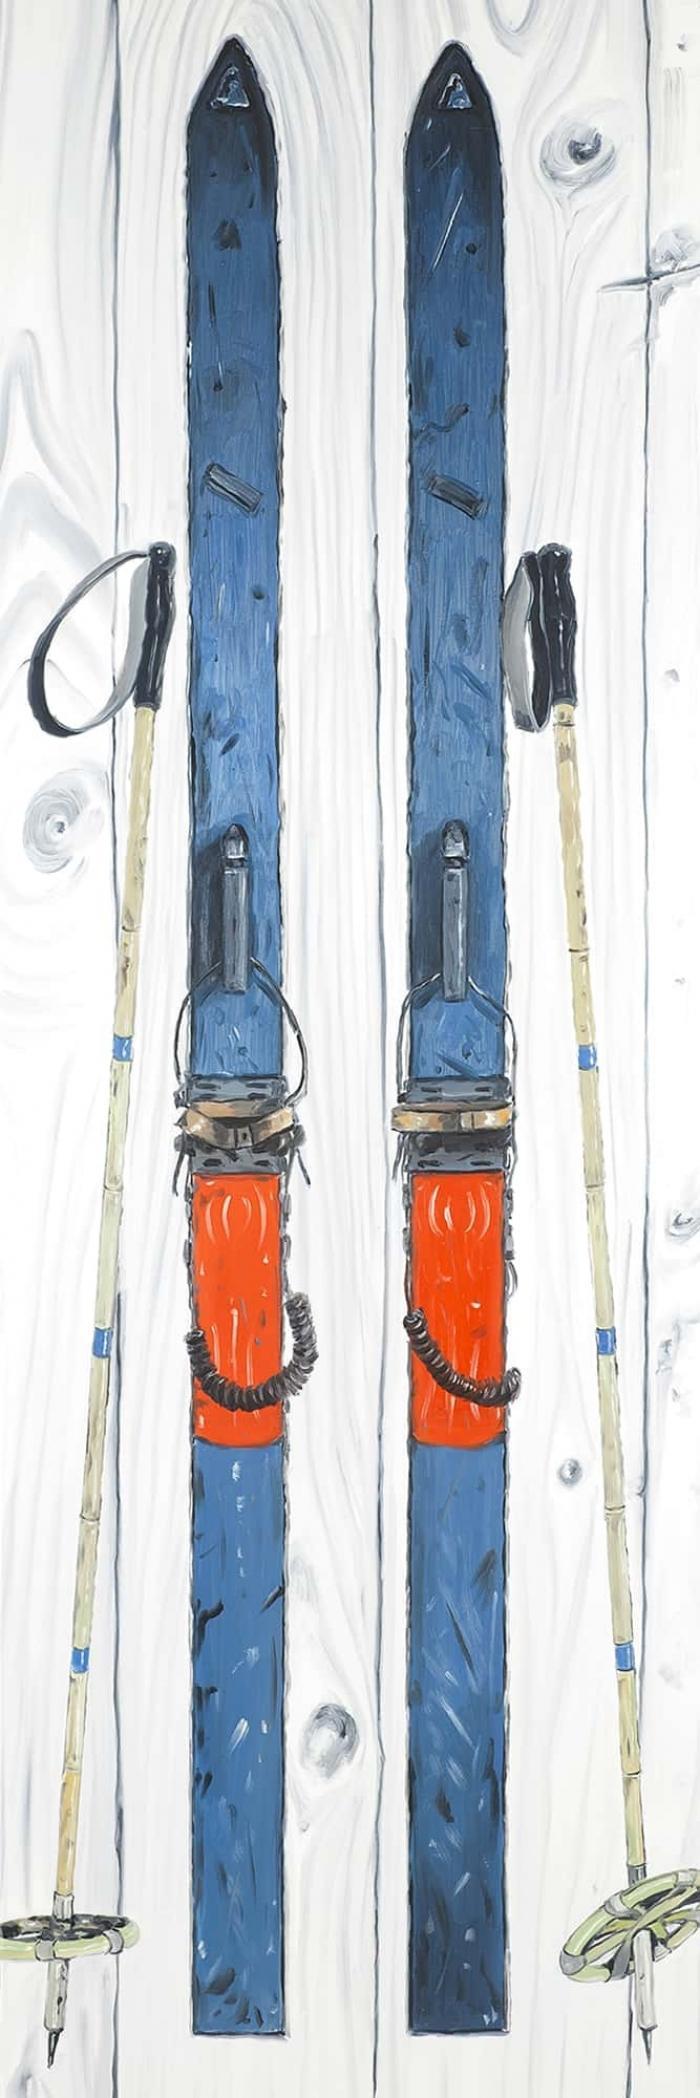 Ski blue vintage